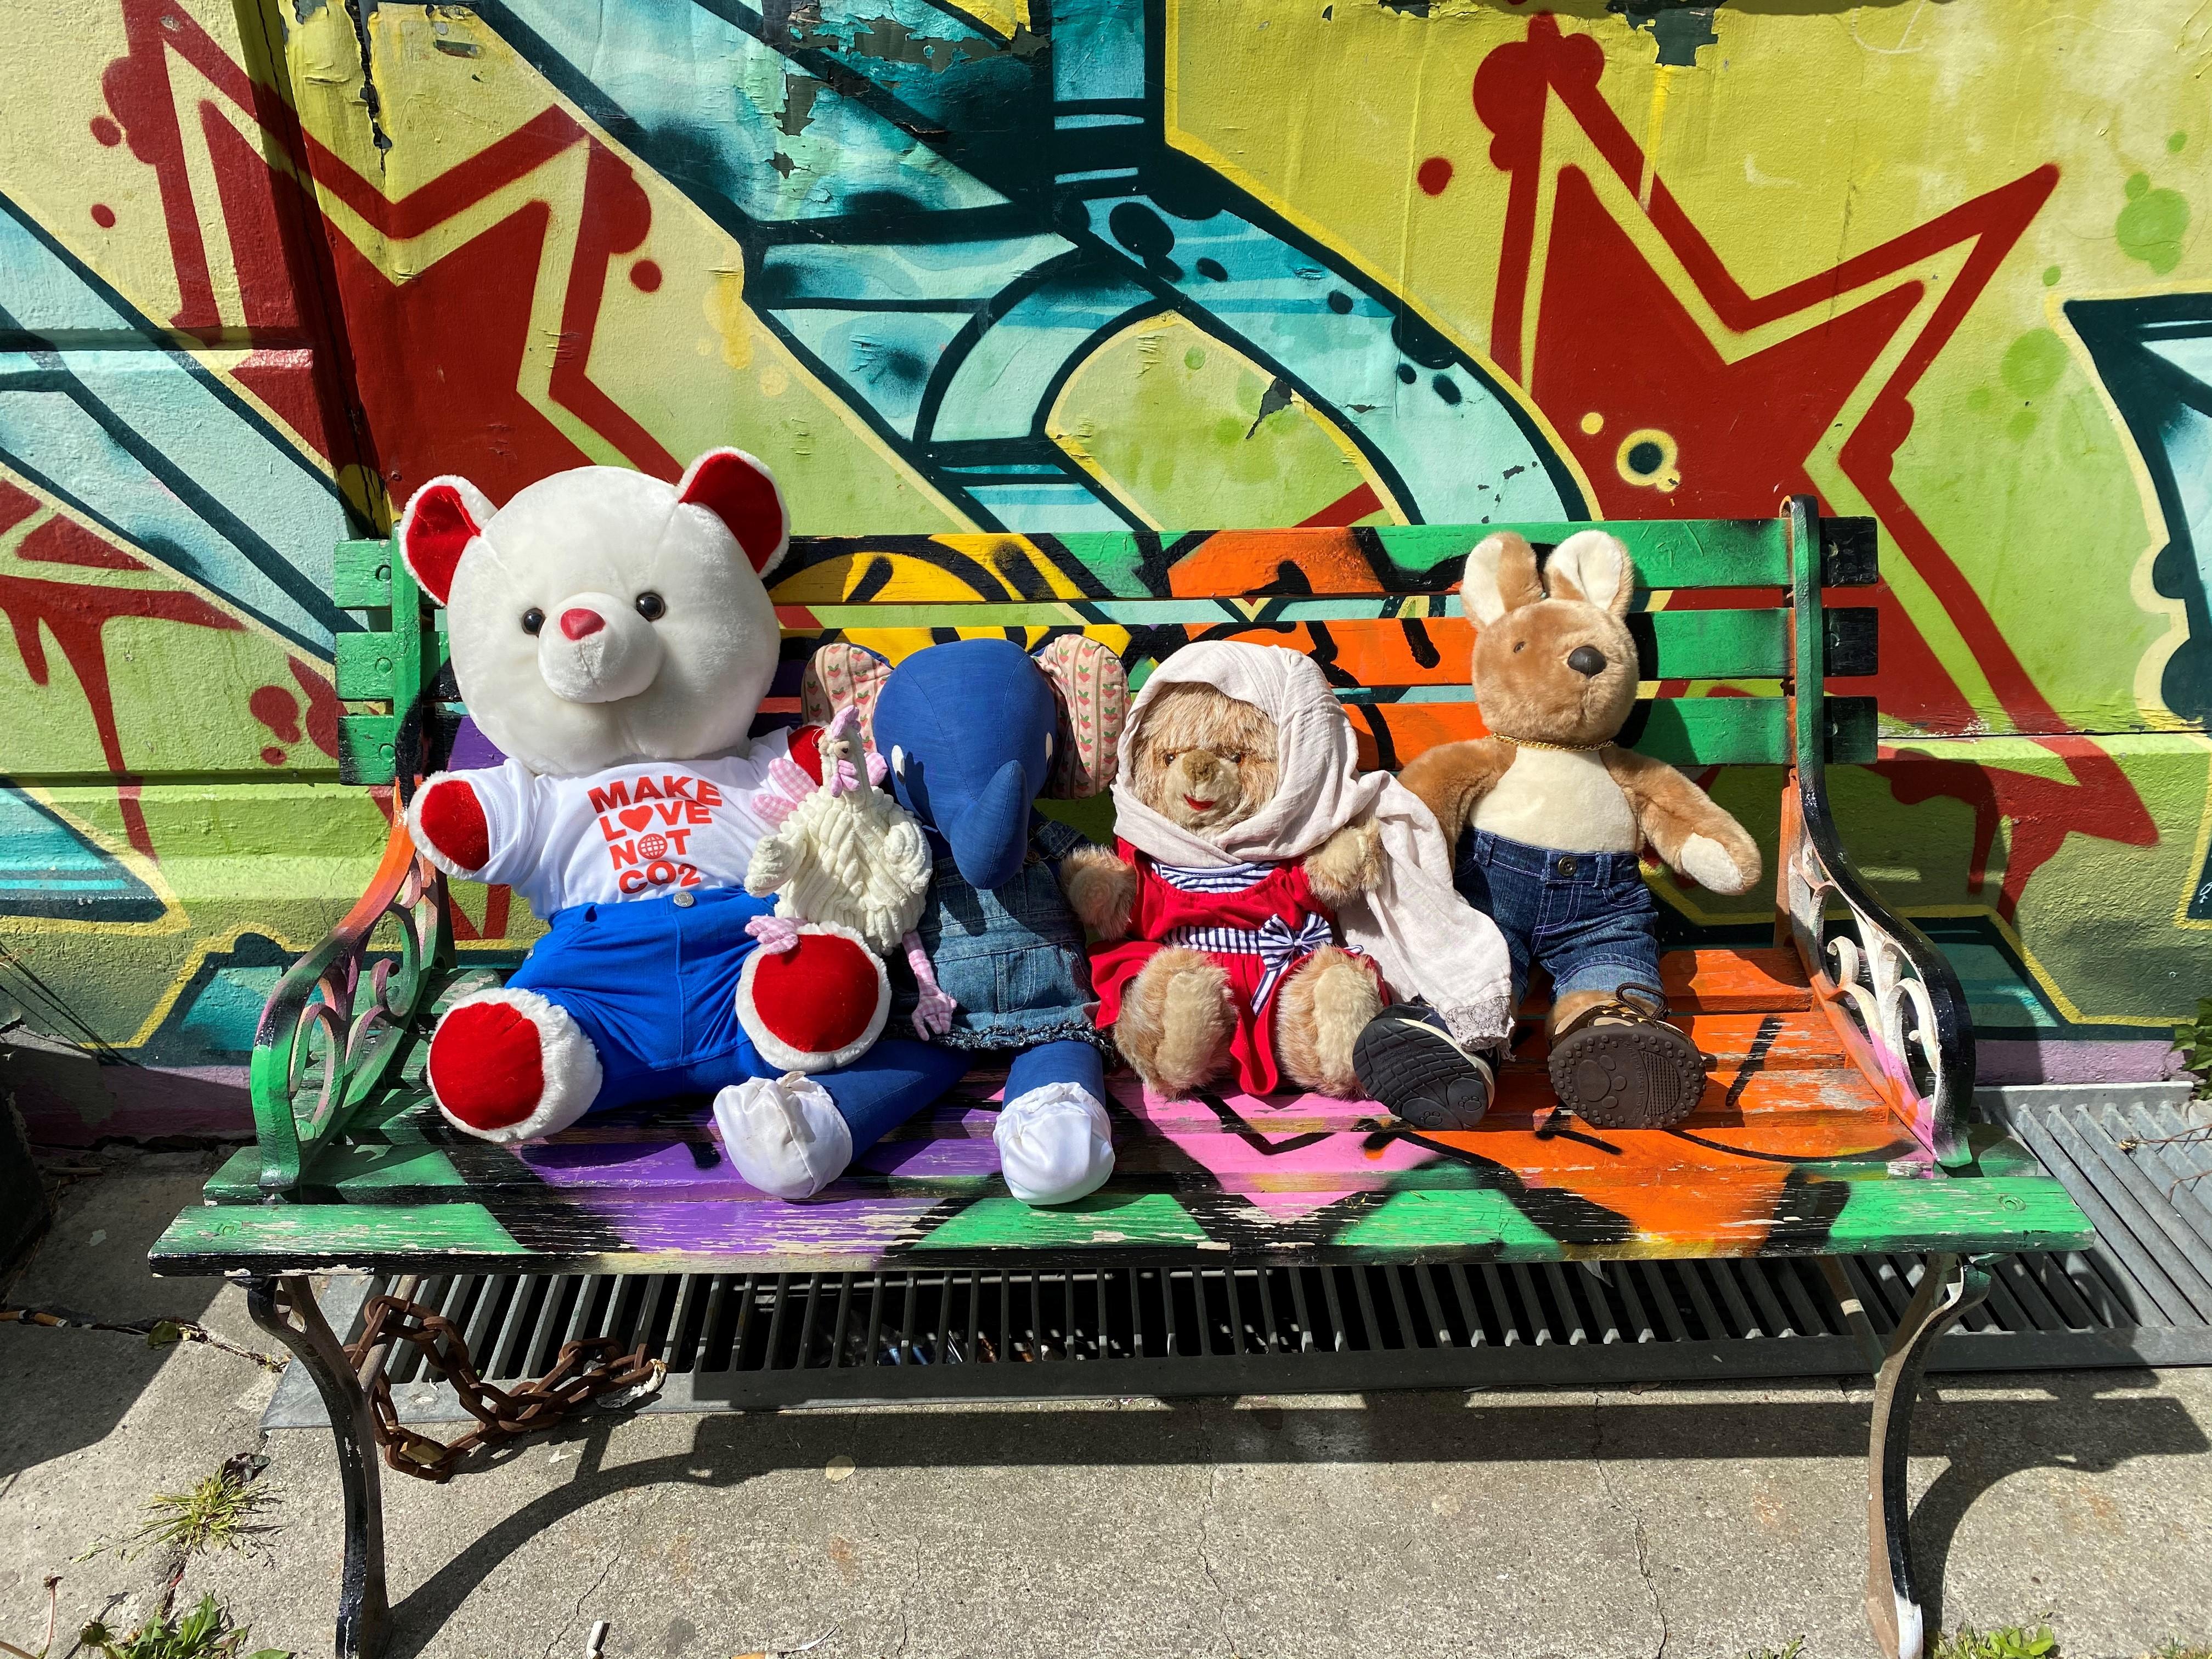 Teddy Bear Hostel Opens In Copenhagen – Send Your Fluffy Friend Now You Can't Travel!